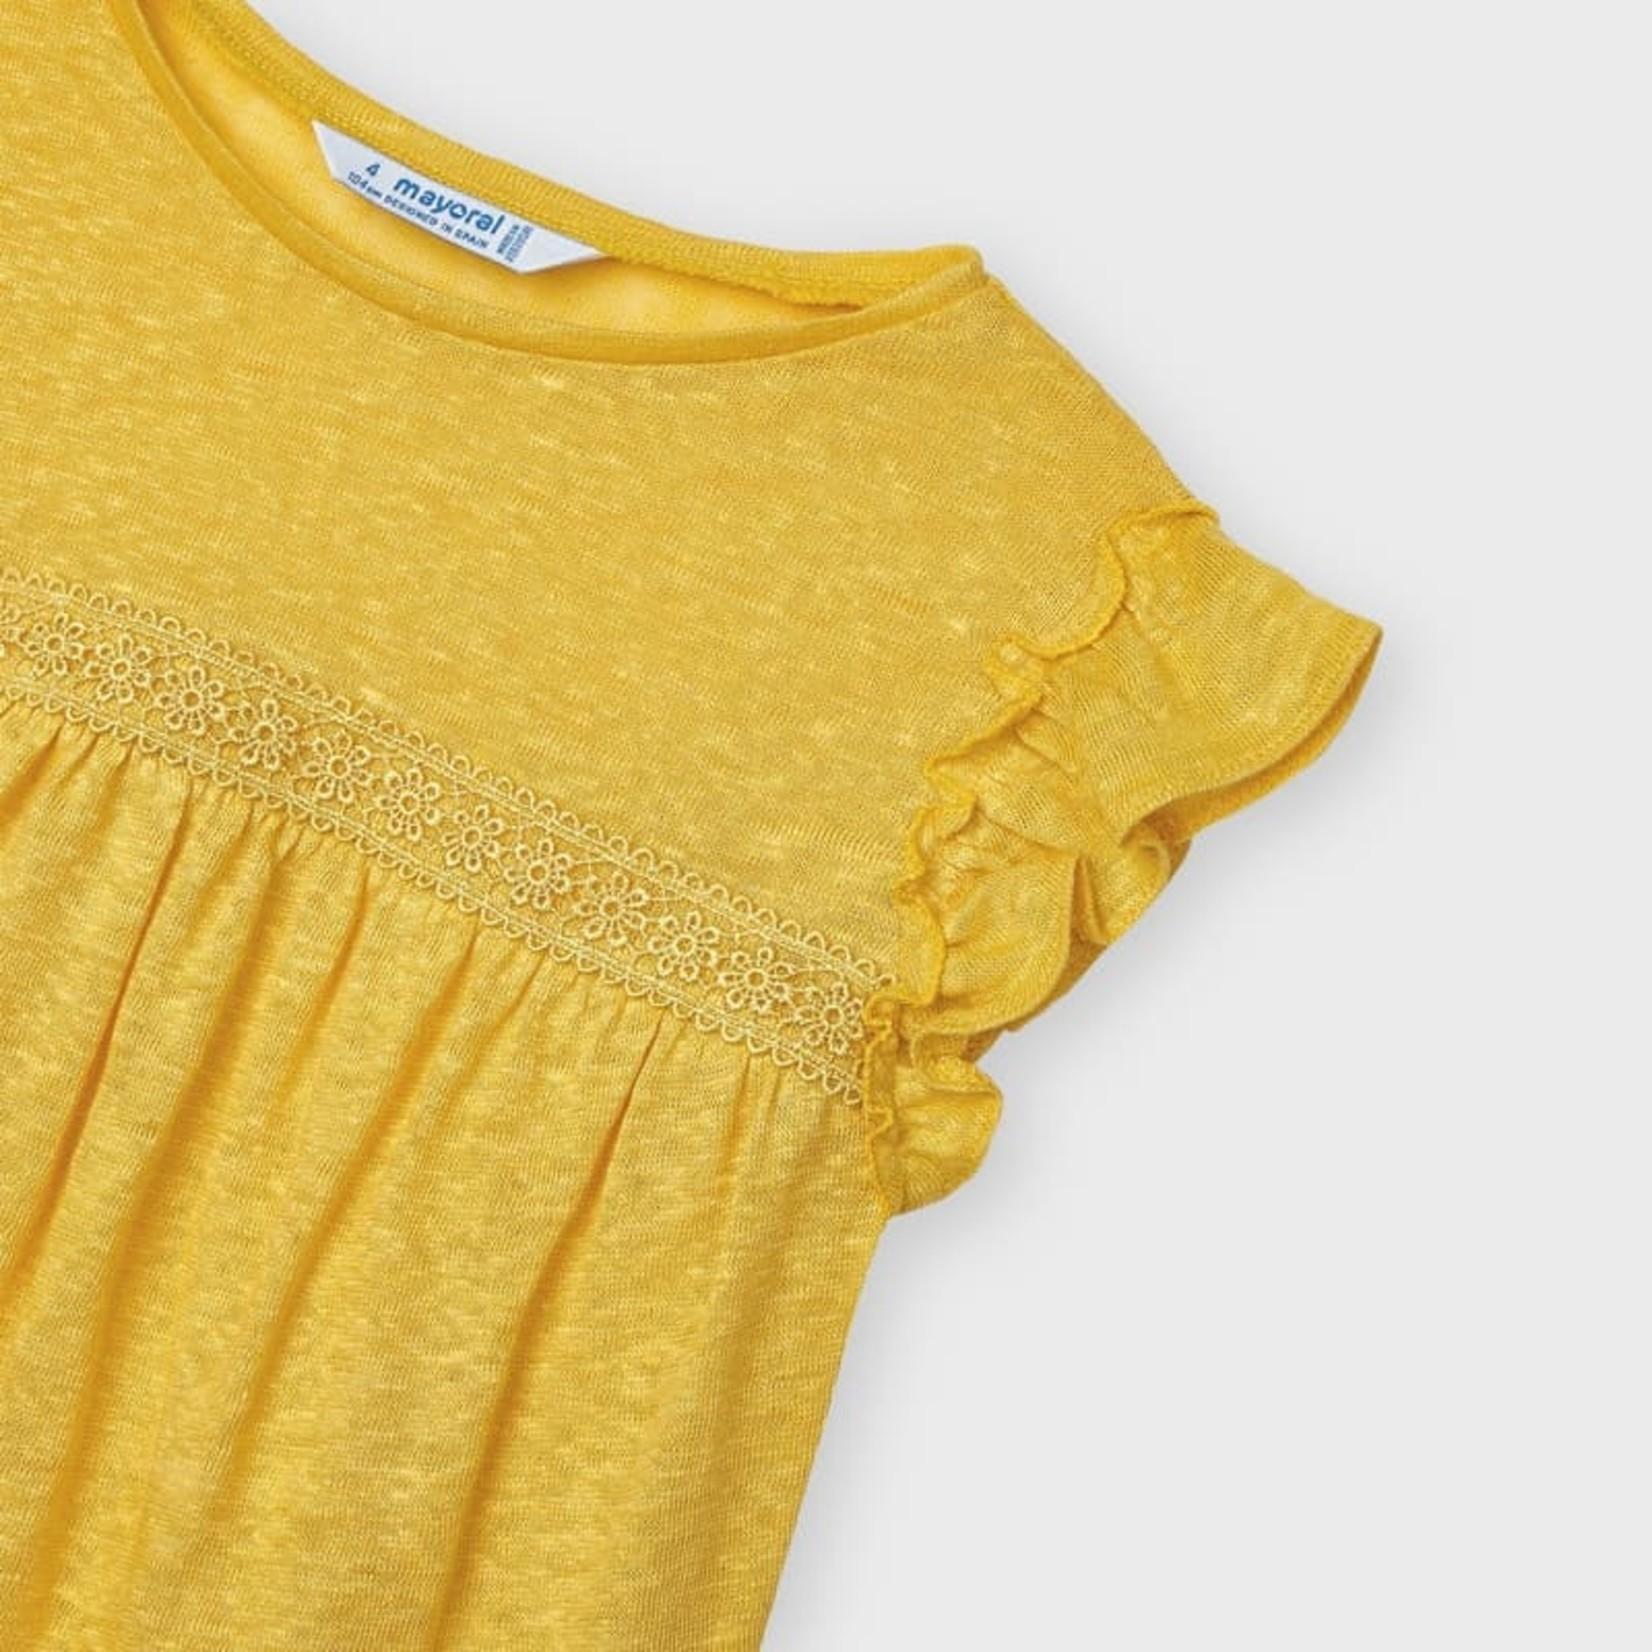 Mayoral linen s/s t-shirt  Mustard